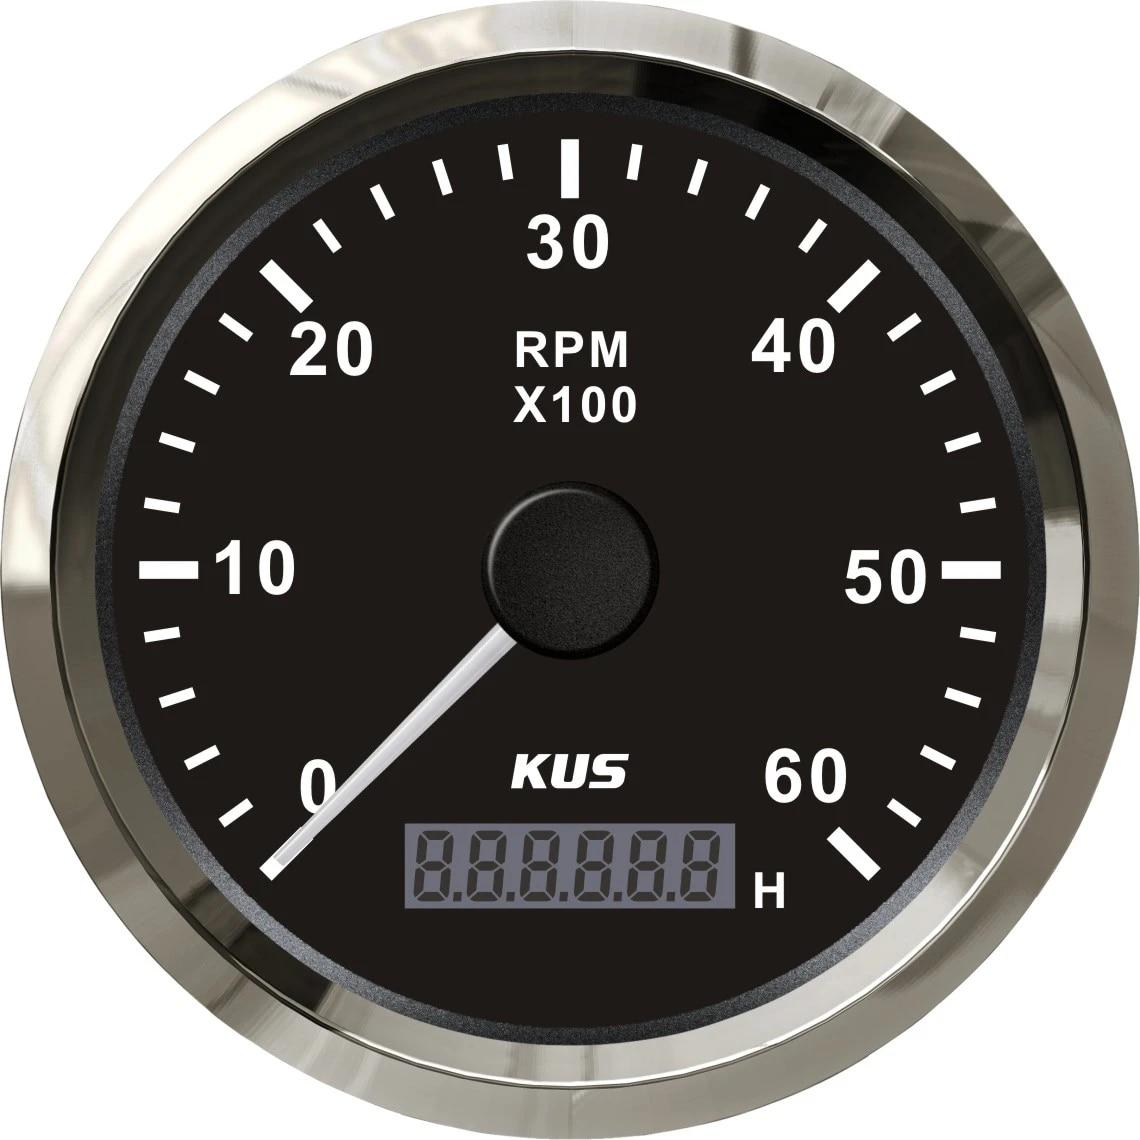 85mm Car Truck Tachometer 6000 RPM Engine Tacho Gauge w// Hour Meter 8 Color LED